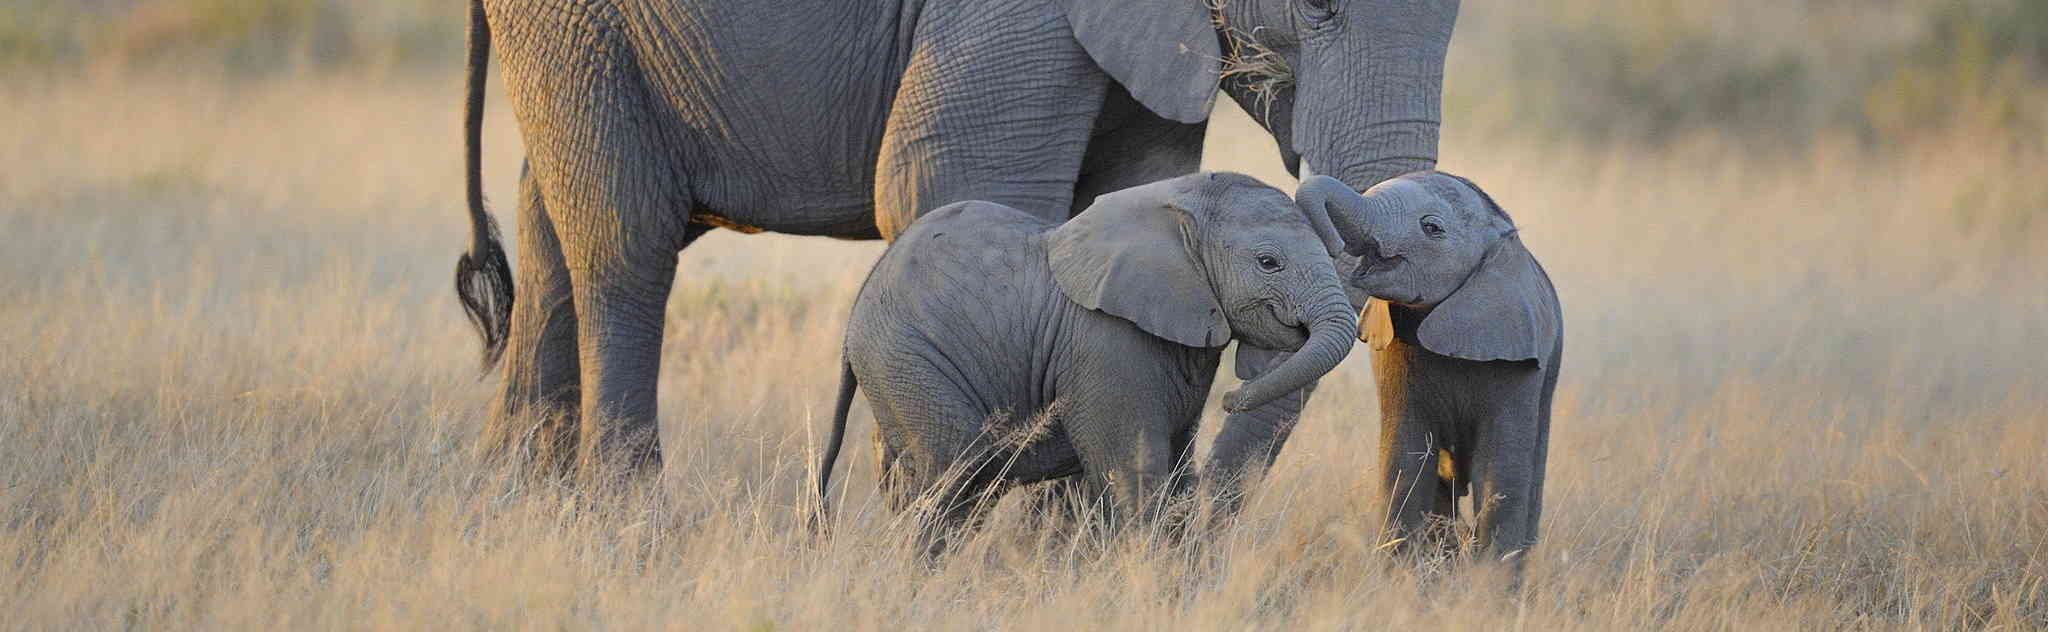 Baby Elephant Twins